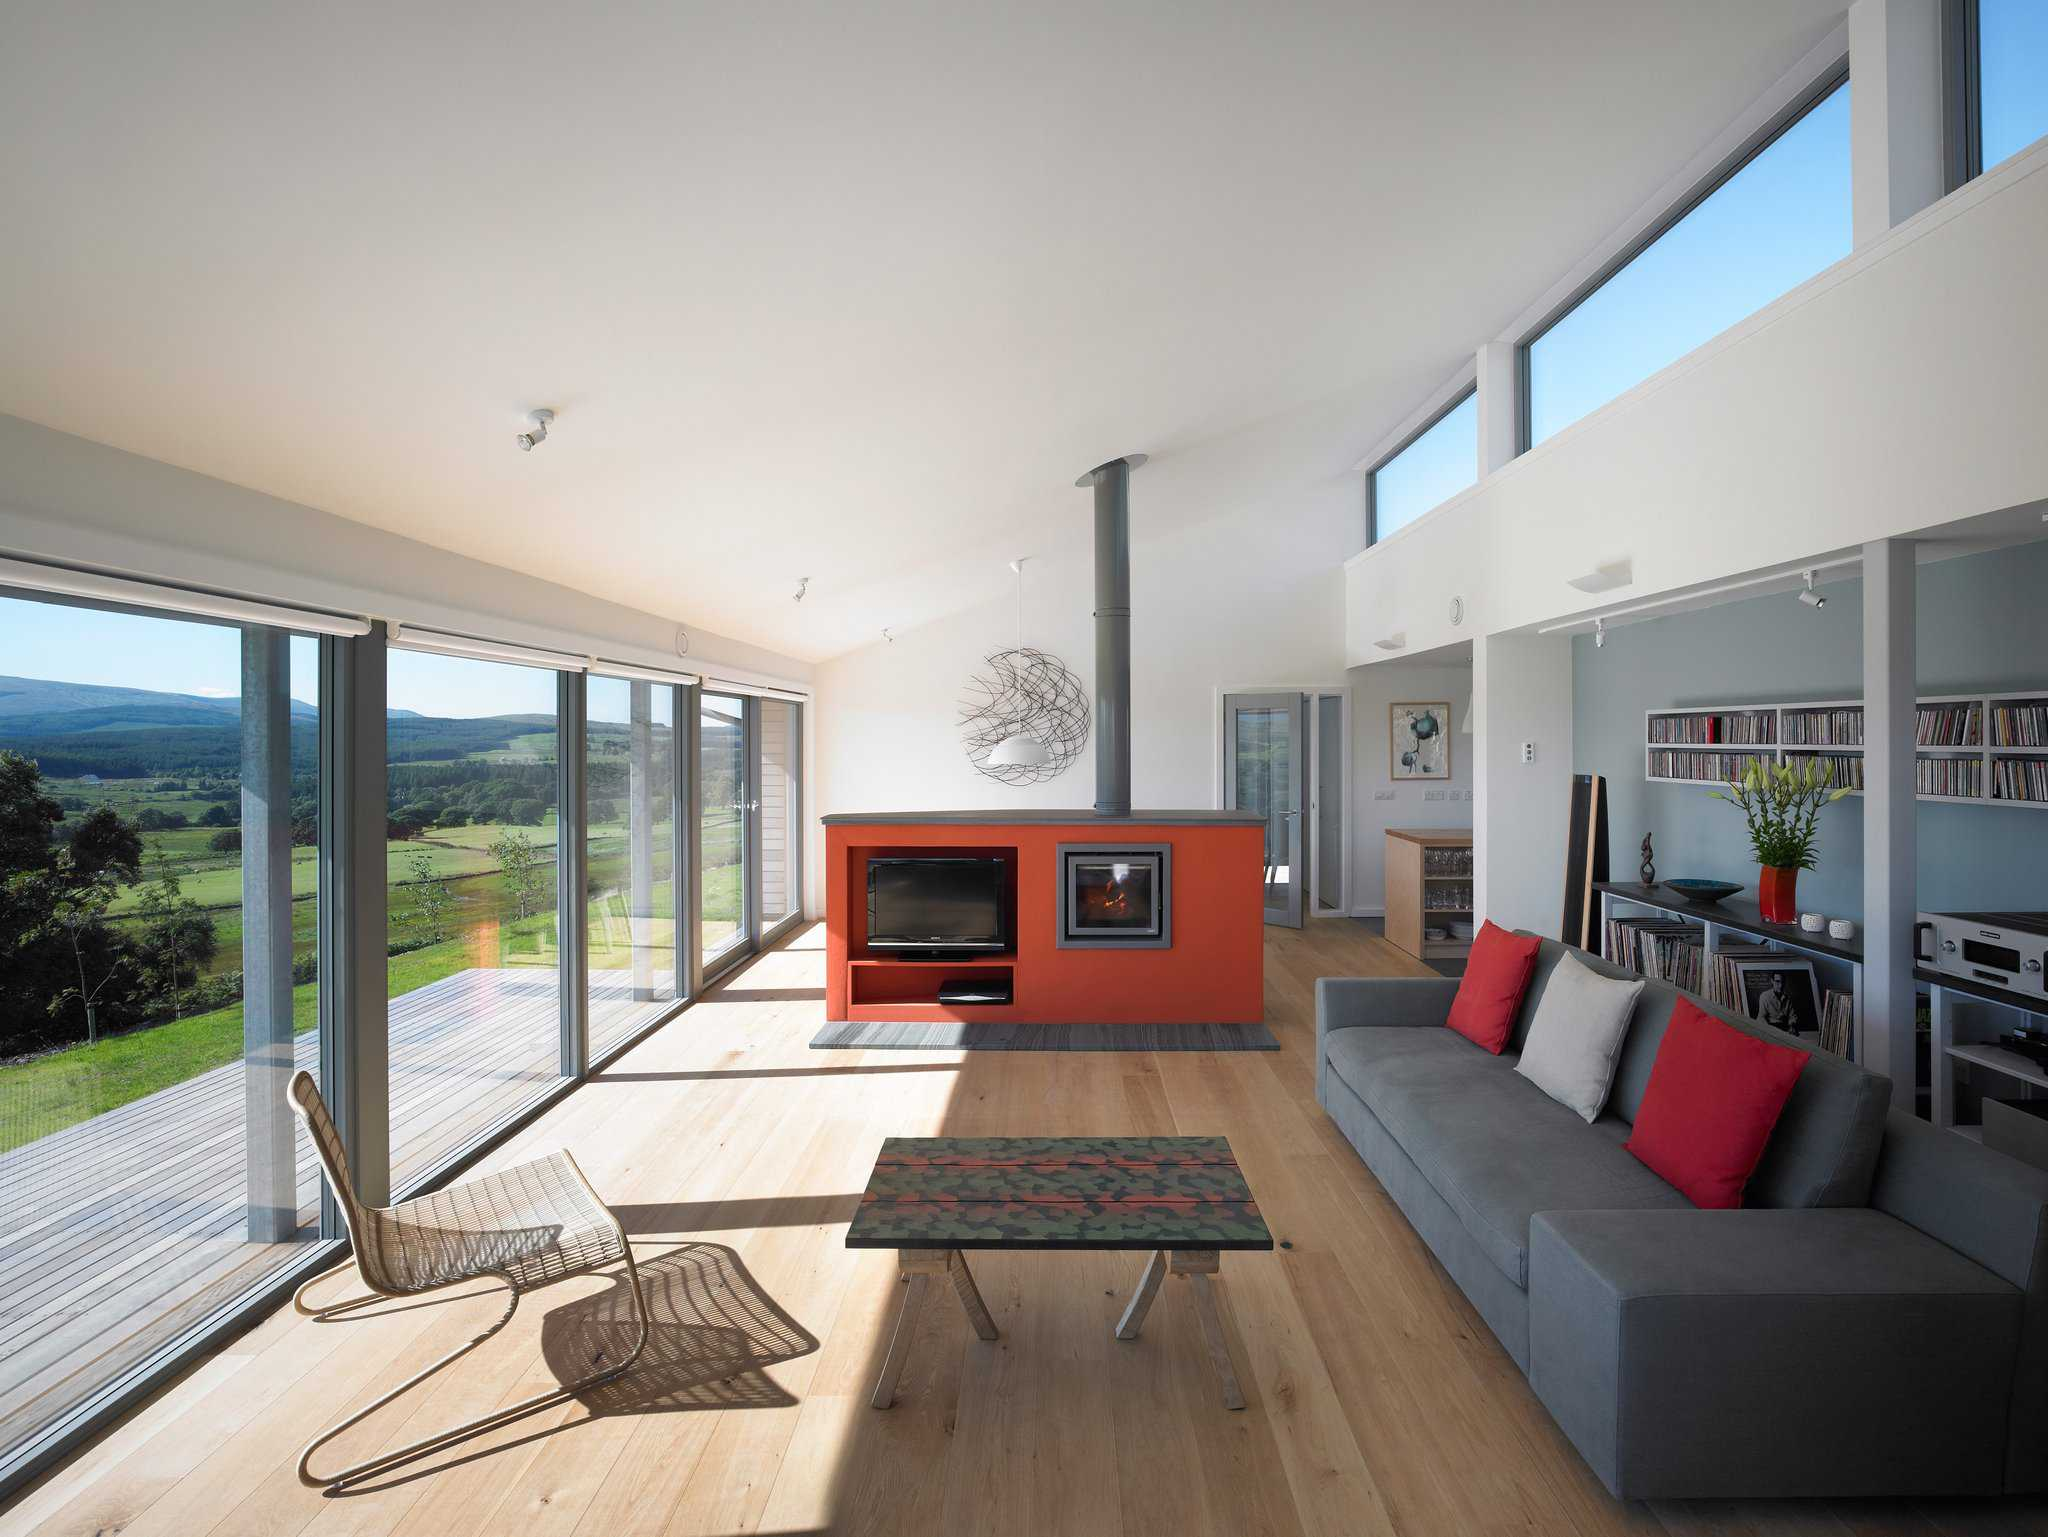 nordan double glazing